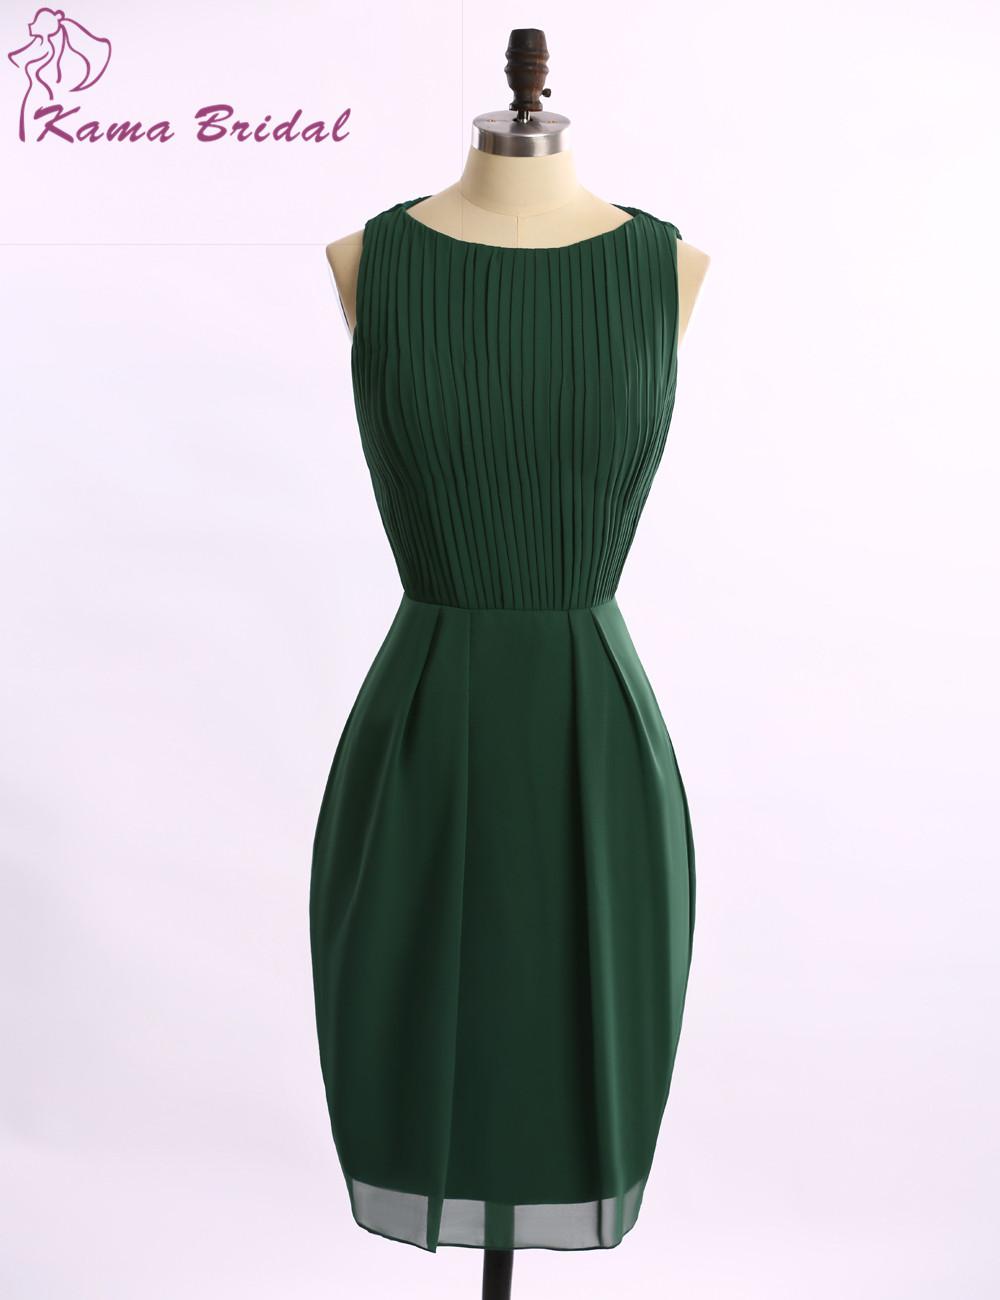 Kama Bridal Fall 2015 Designer Chiffon Dresses Emerald